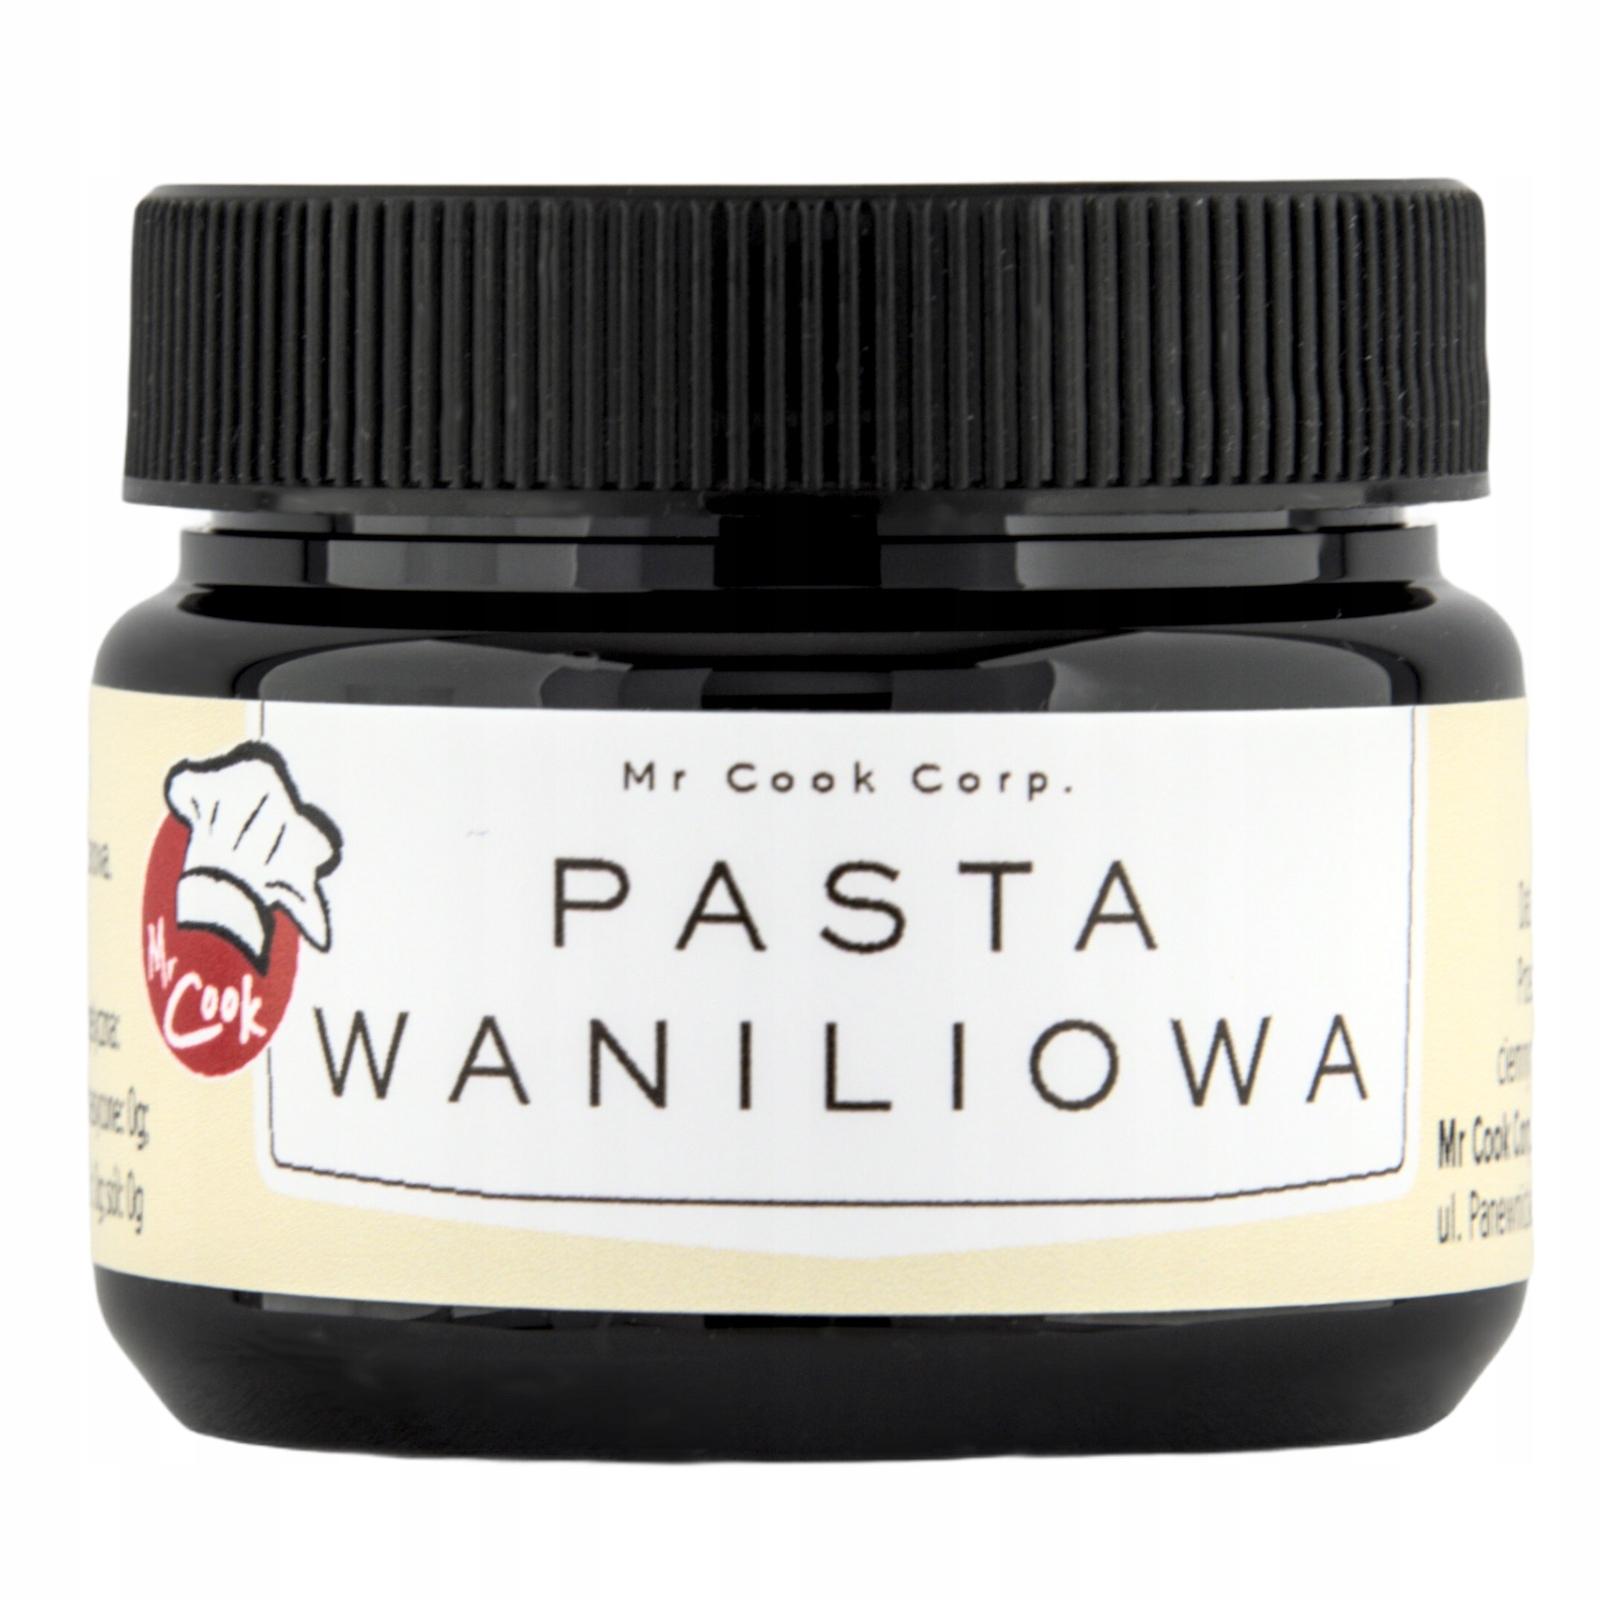 Pasta Wanilia Bourbon 60g - Ekstrakt wanilii 40%